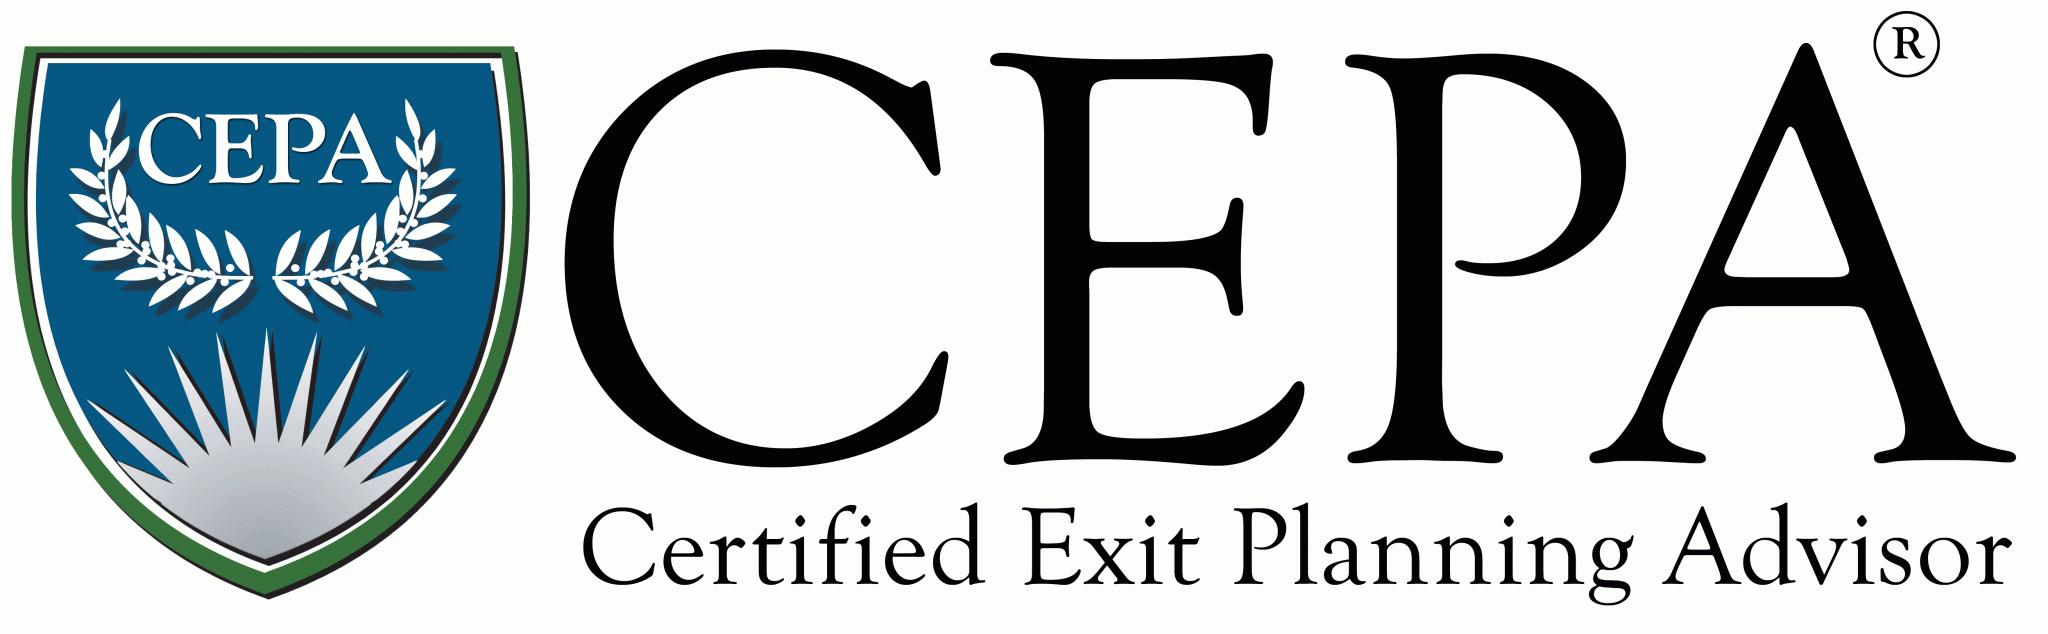 Tealwood Wealth Management Advisor, Todd Krough, Earns Prestigious CEPA® Designation